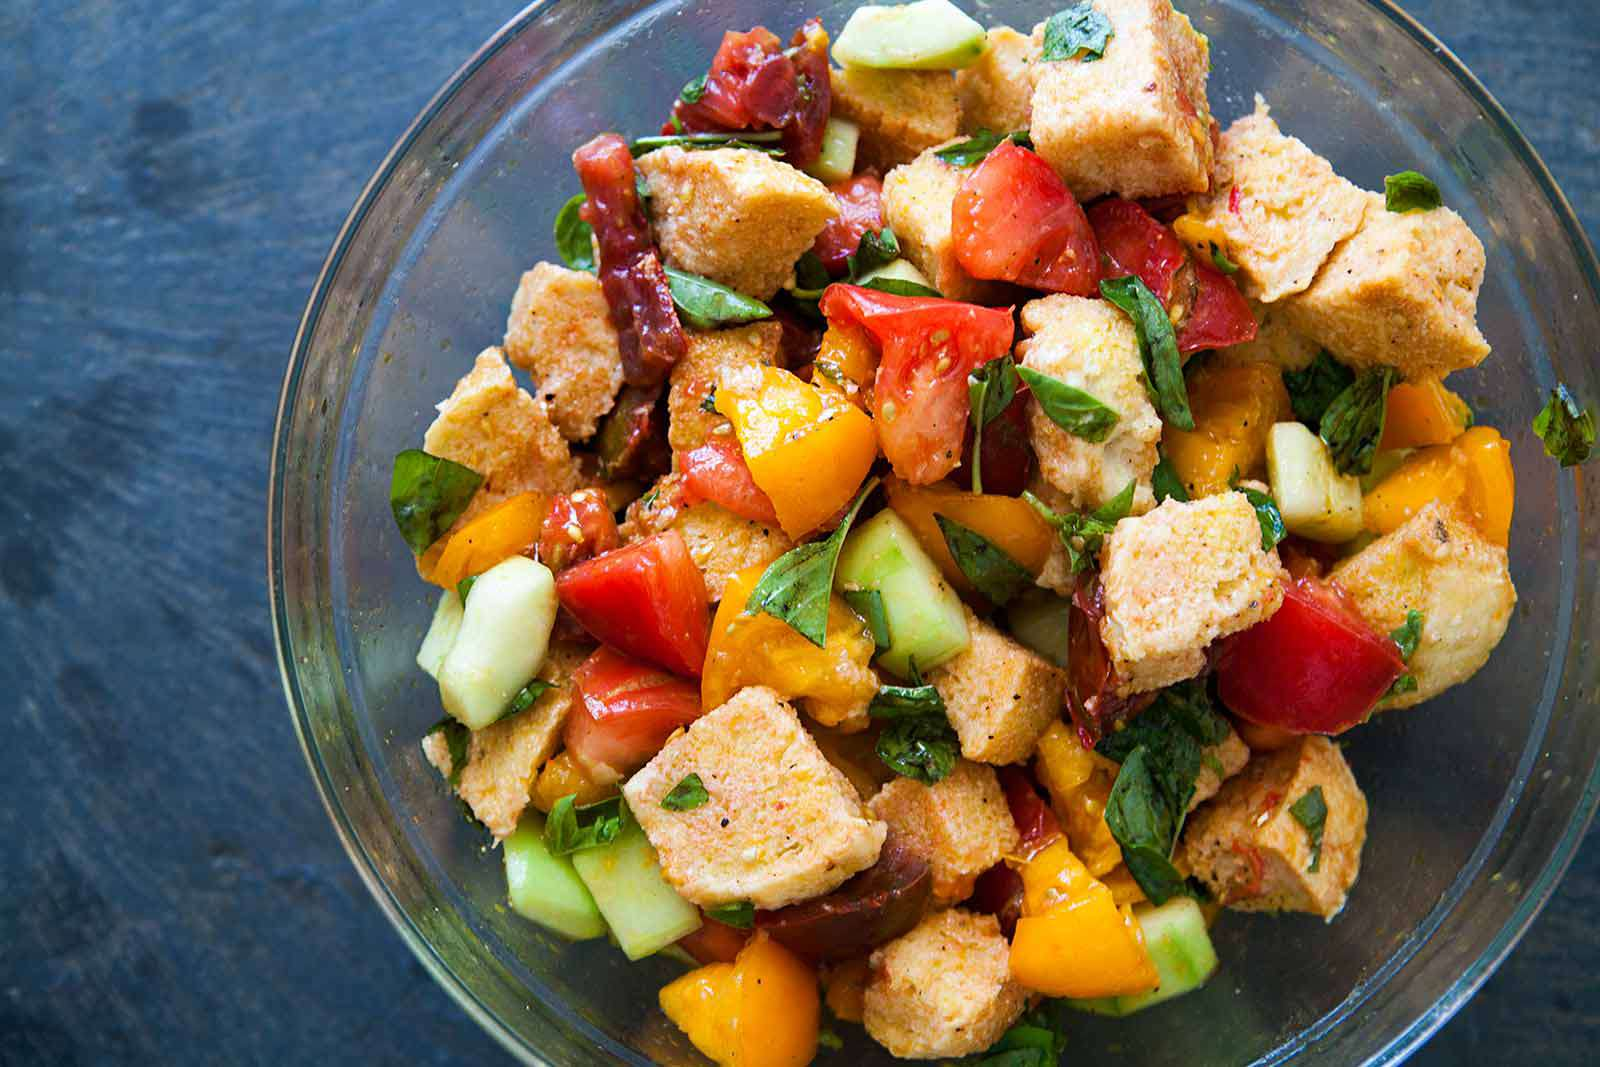 Panzanella Bread Salad in a glass serving bowl